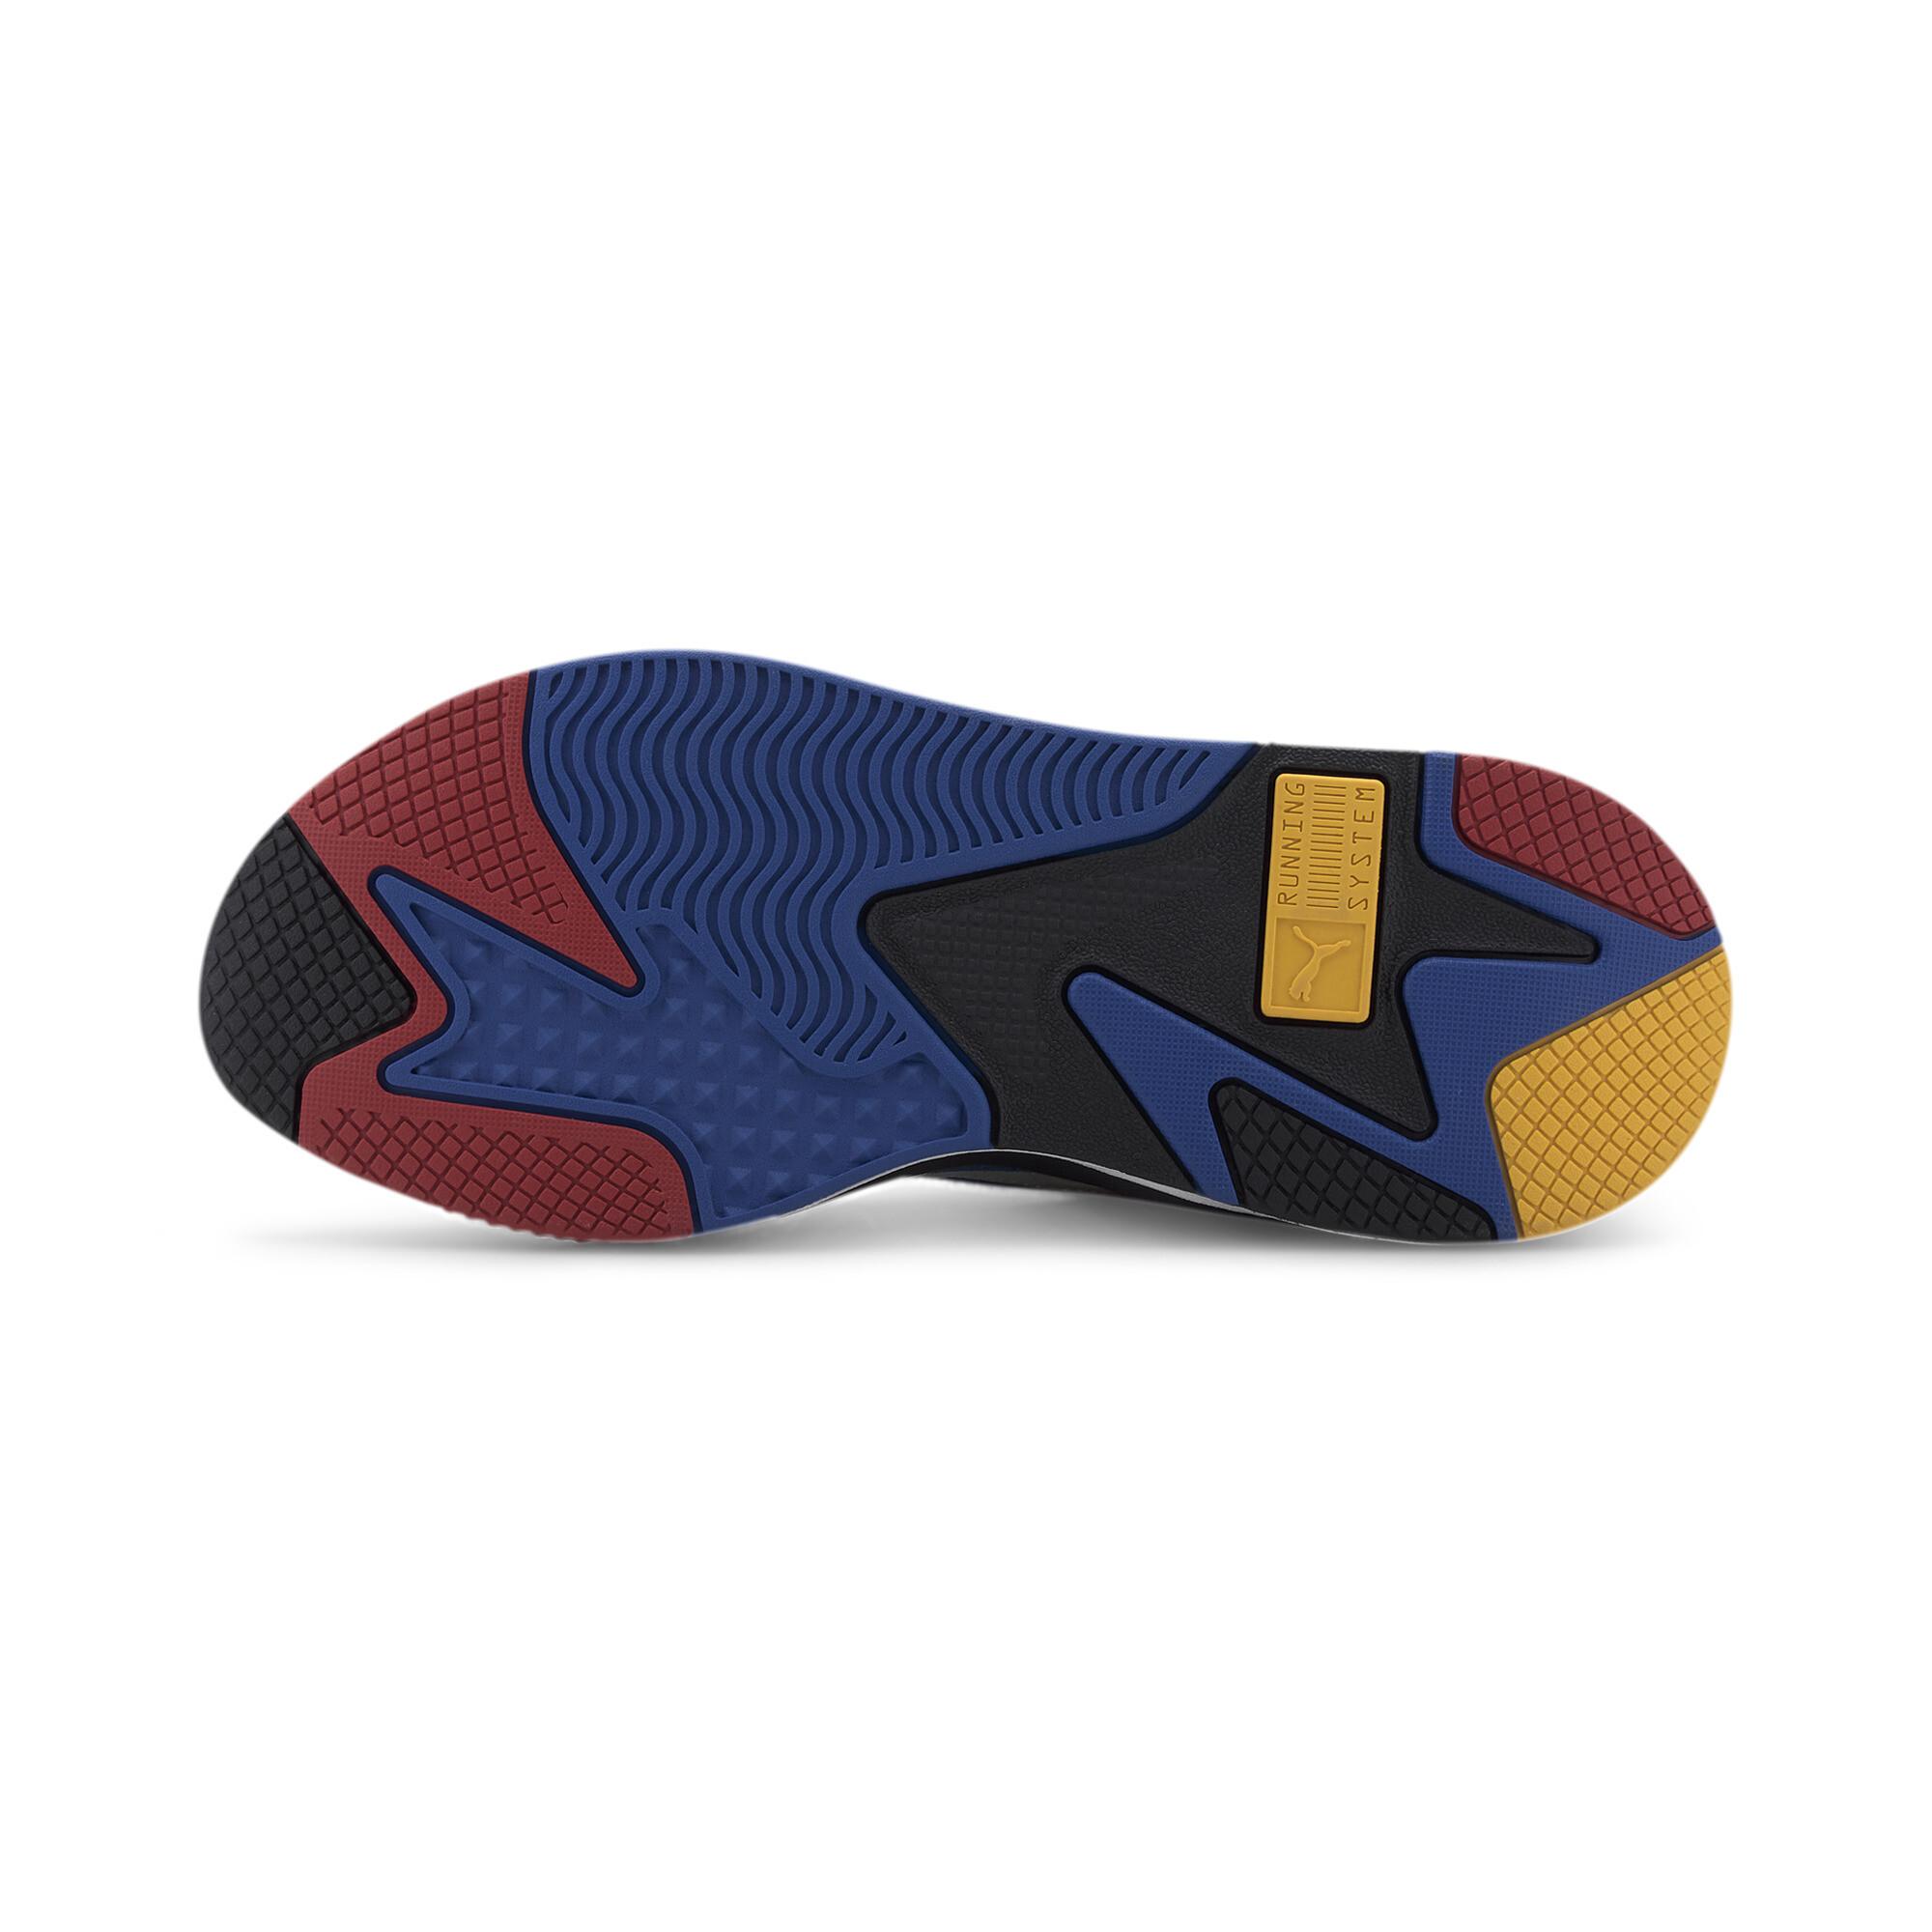 PUMA-Men-039-s-RS-X-Puzzle-Sneakers thumbnail 31